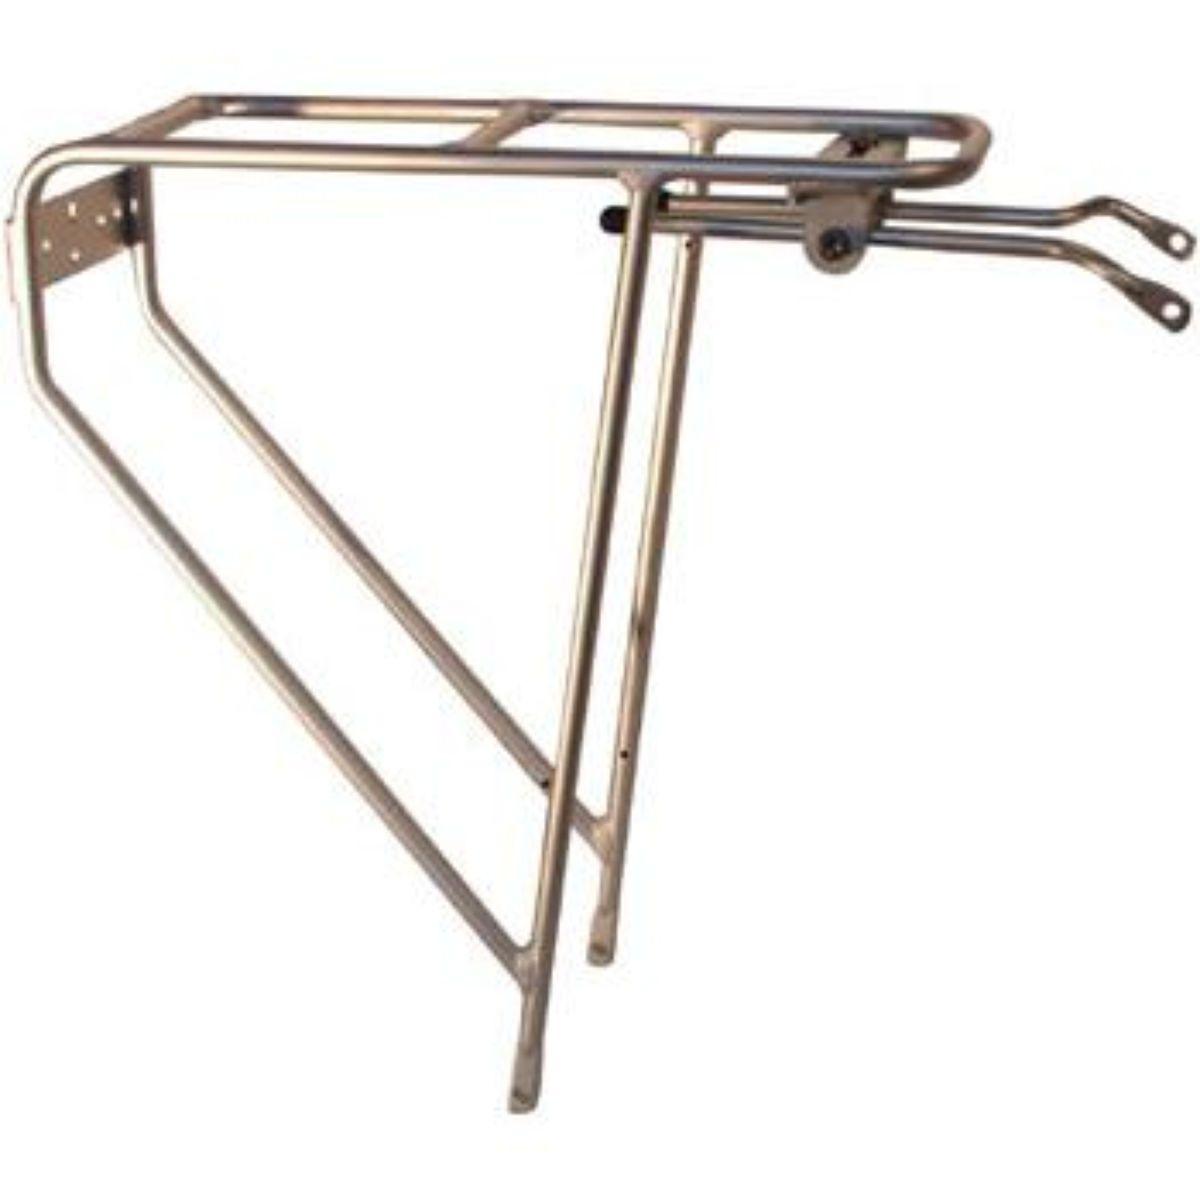 Wiggle Tortec Ultralite Rear Rack Pannier Racks Bici